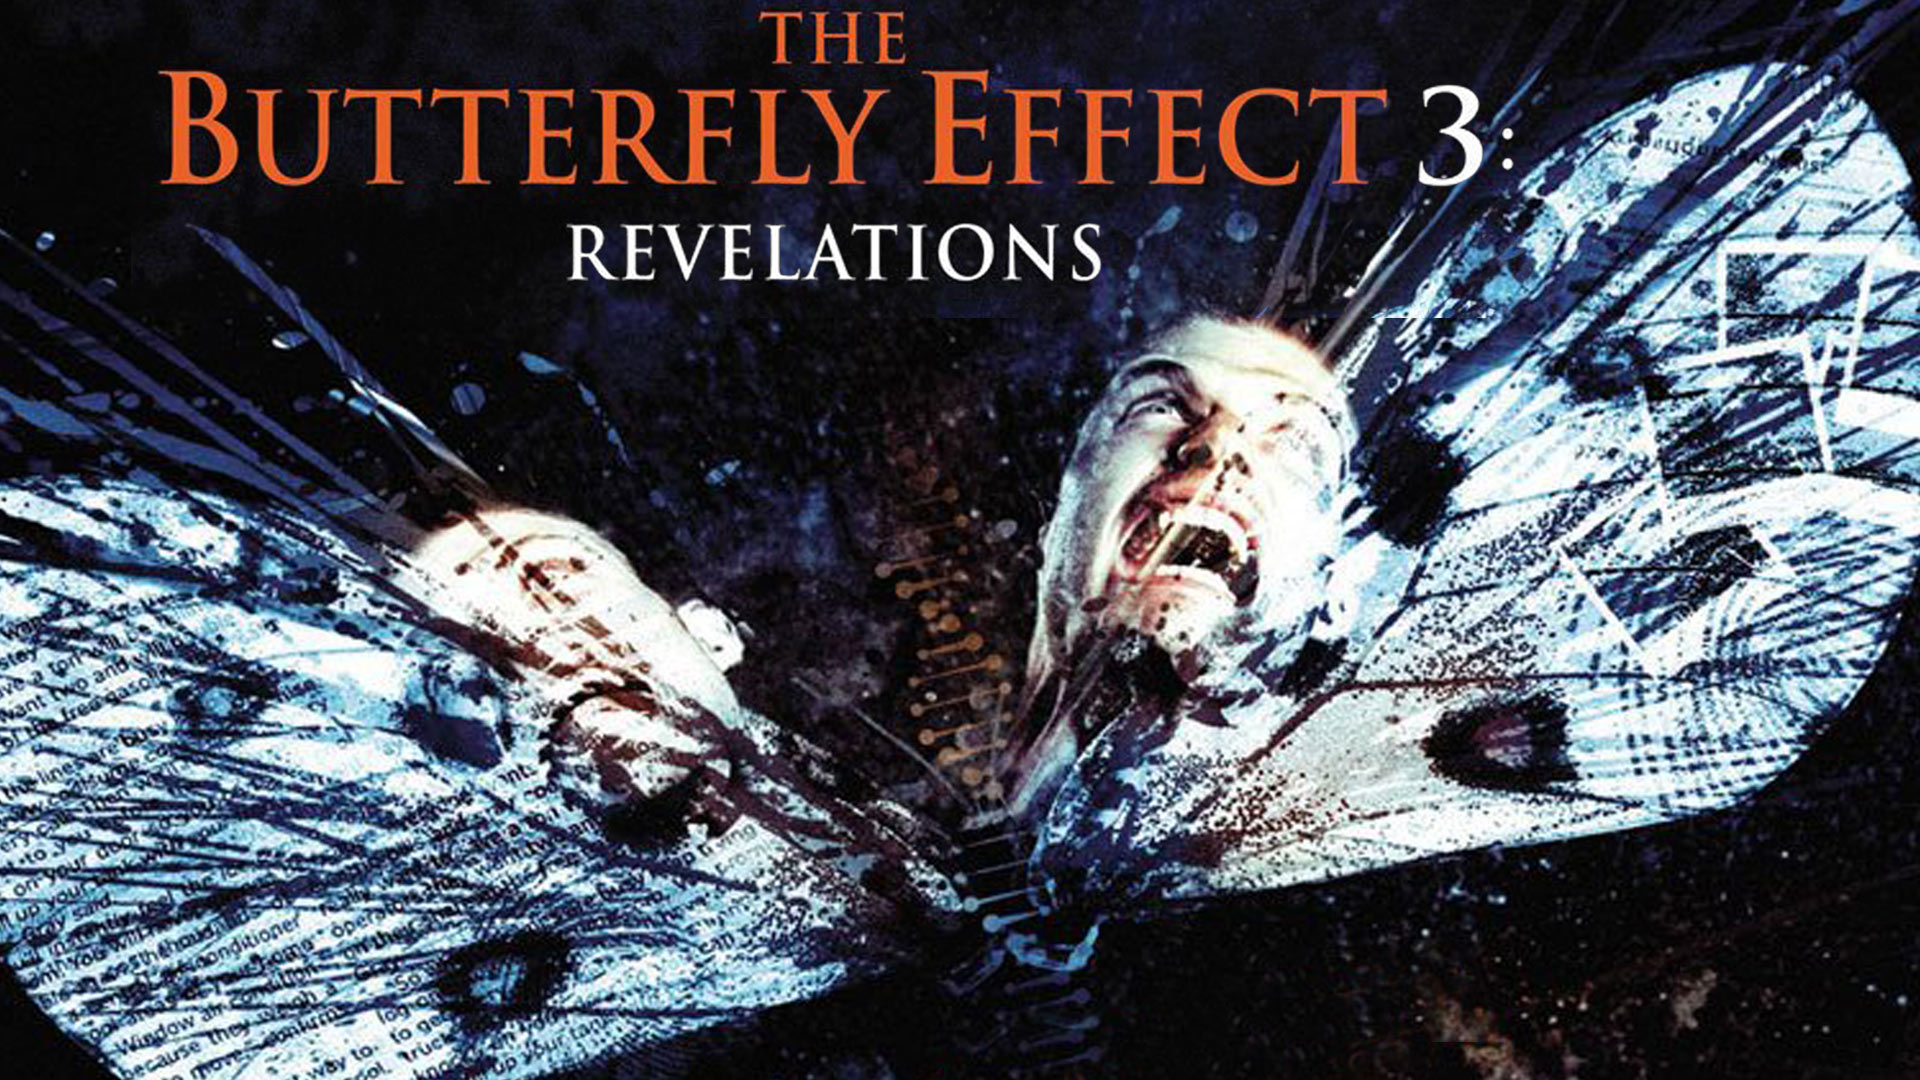 Butterfly Effect 3: Revelations